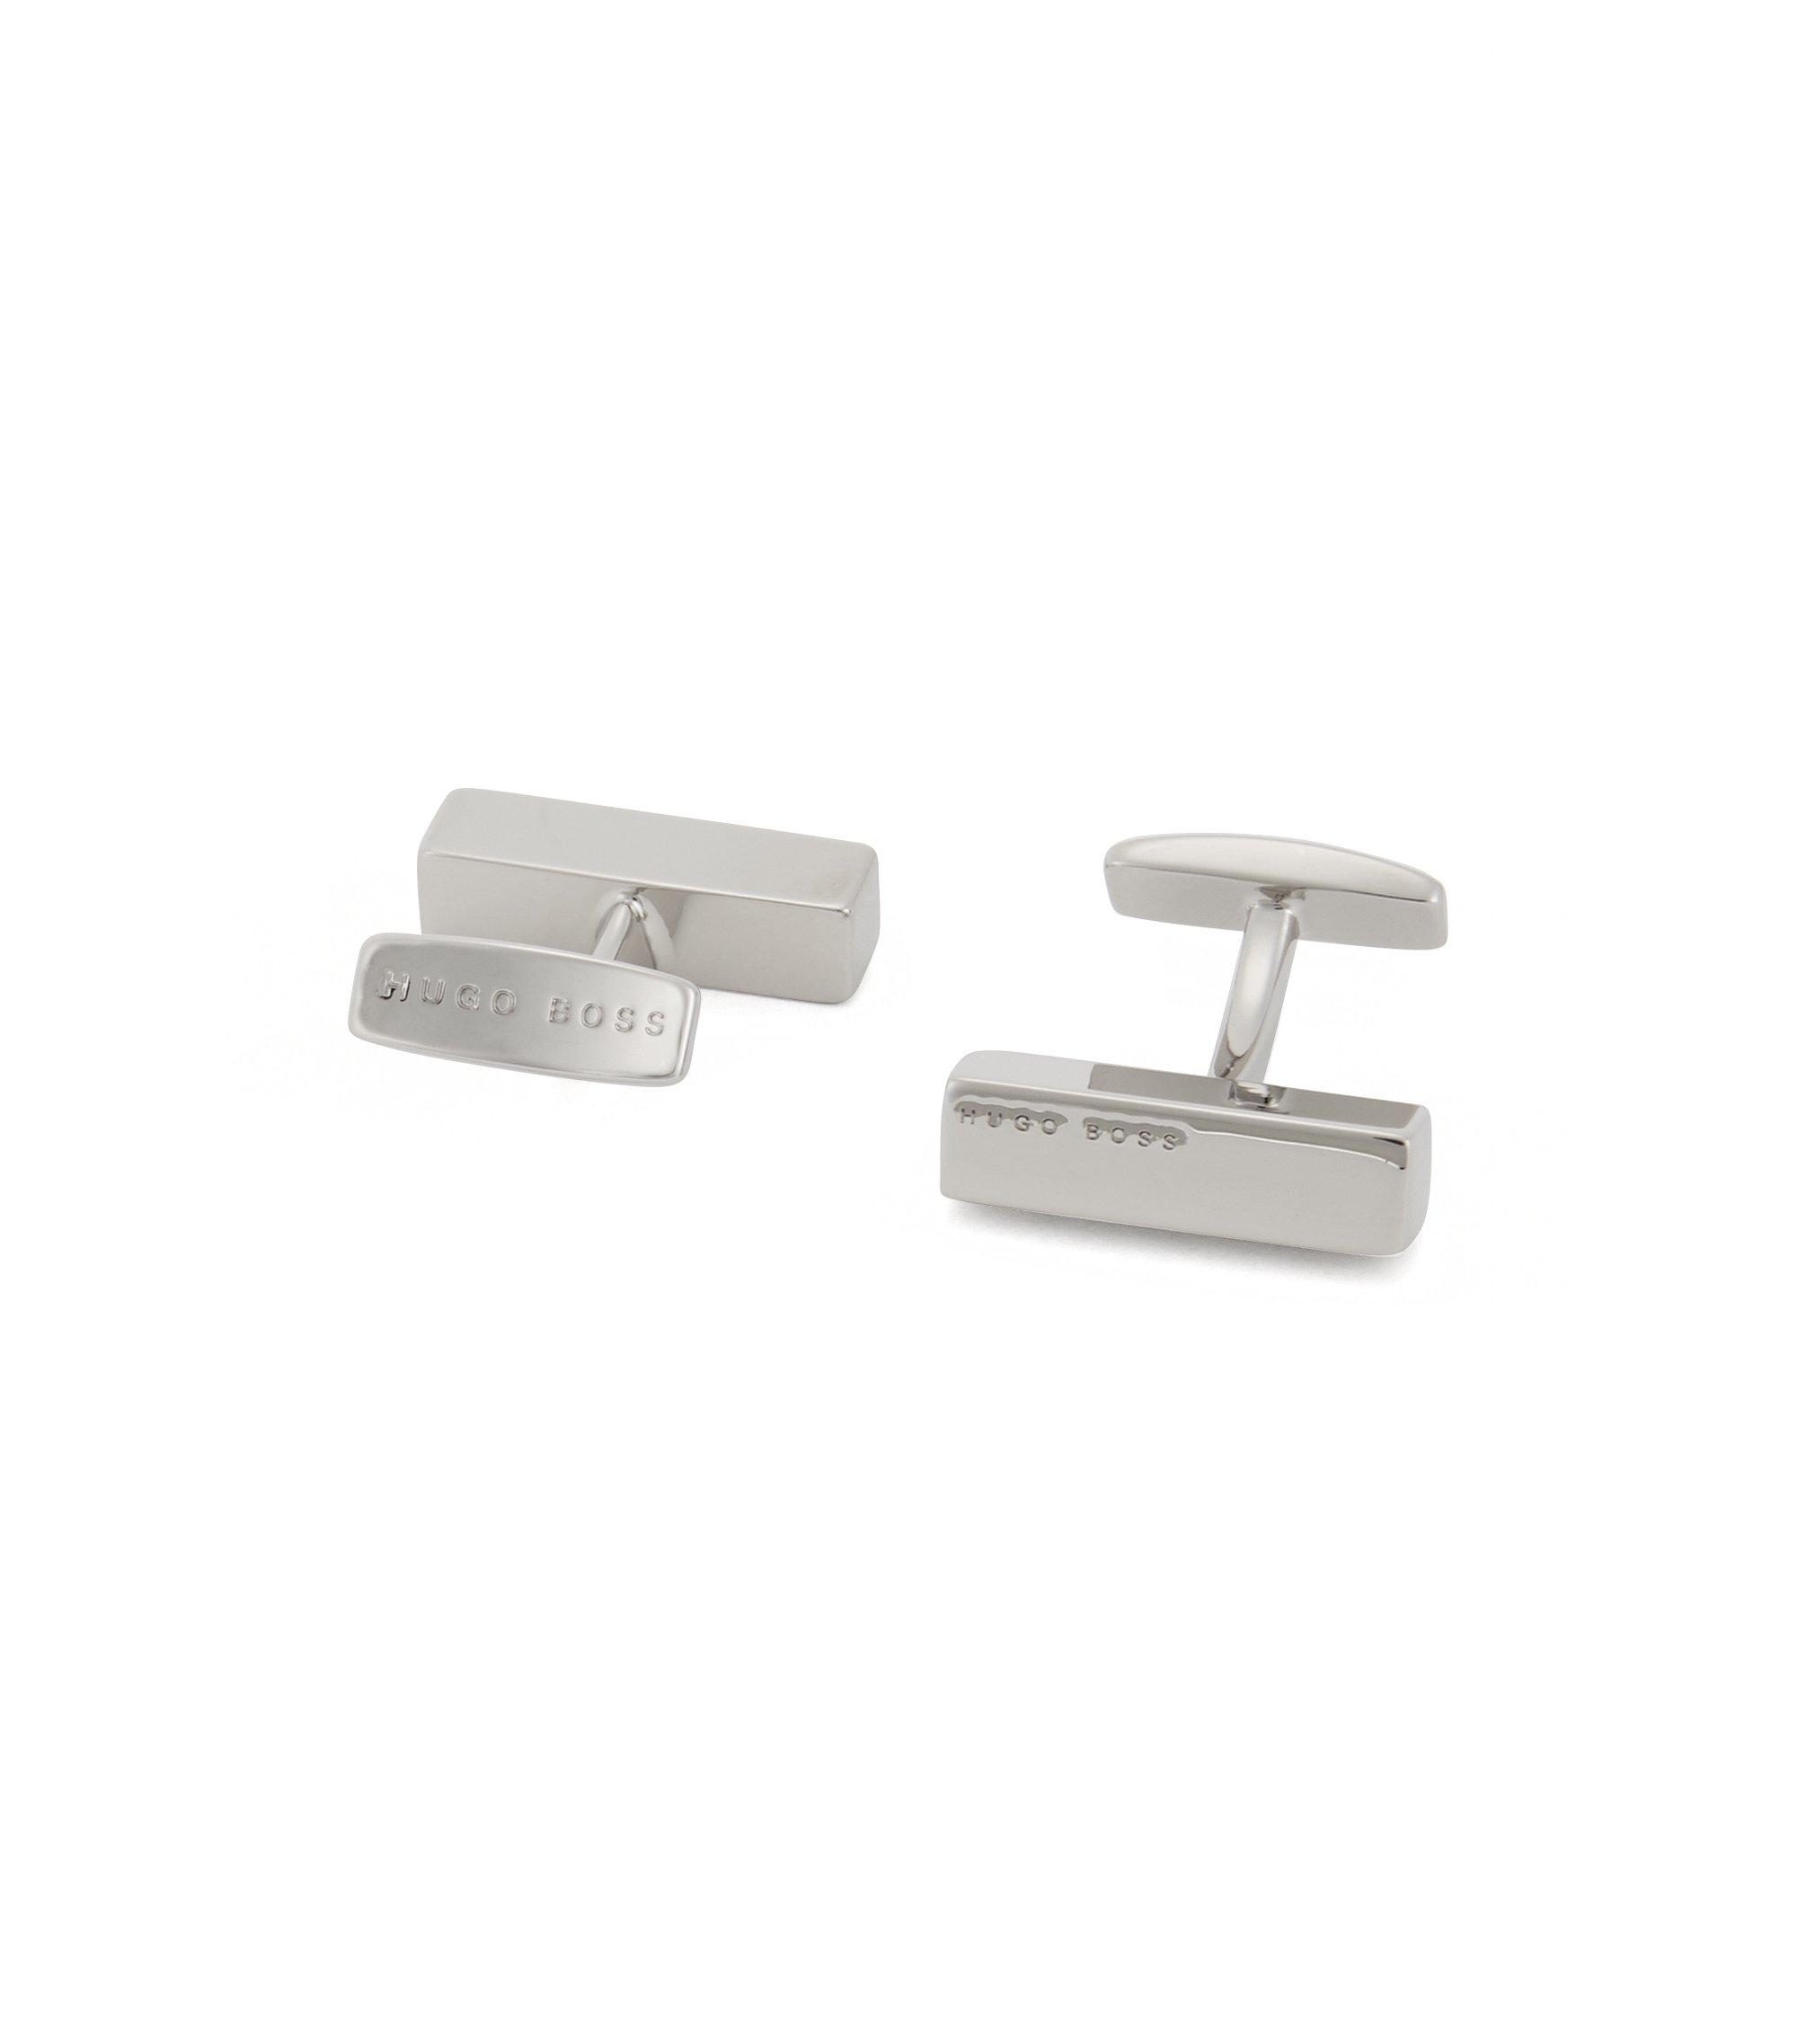 Brass tie clip and cufflinks gift set, Silver